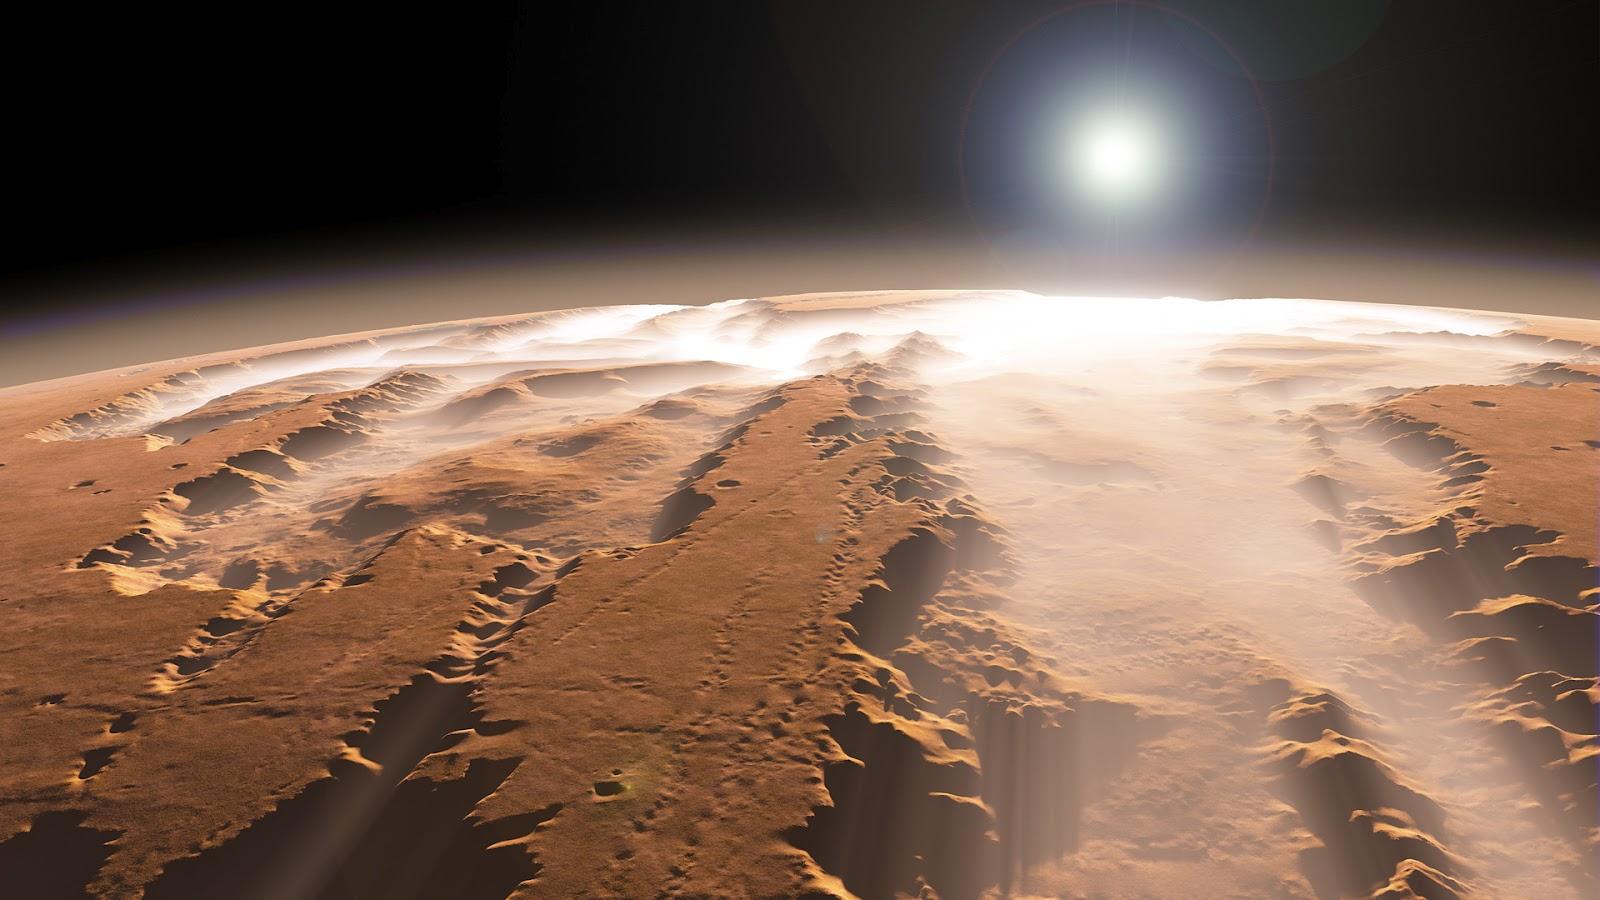 http://3.bp.blogspot.com/-VGFhEiUuUzE/UCY1M_xgjqI/AAAAAAAAMWU/l49TDR_yrpk/s1600/mars-wallpaper-canyon-sun-fog-planet.jpg